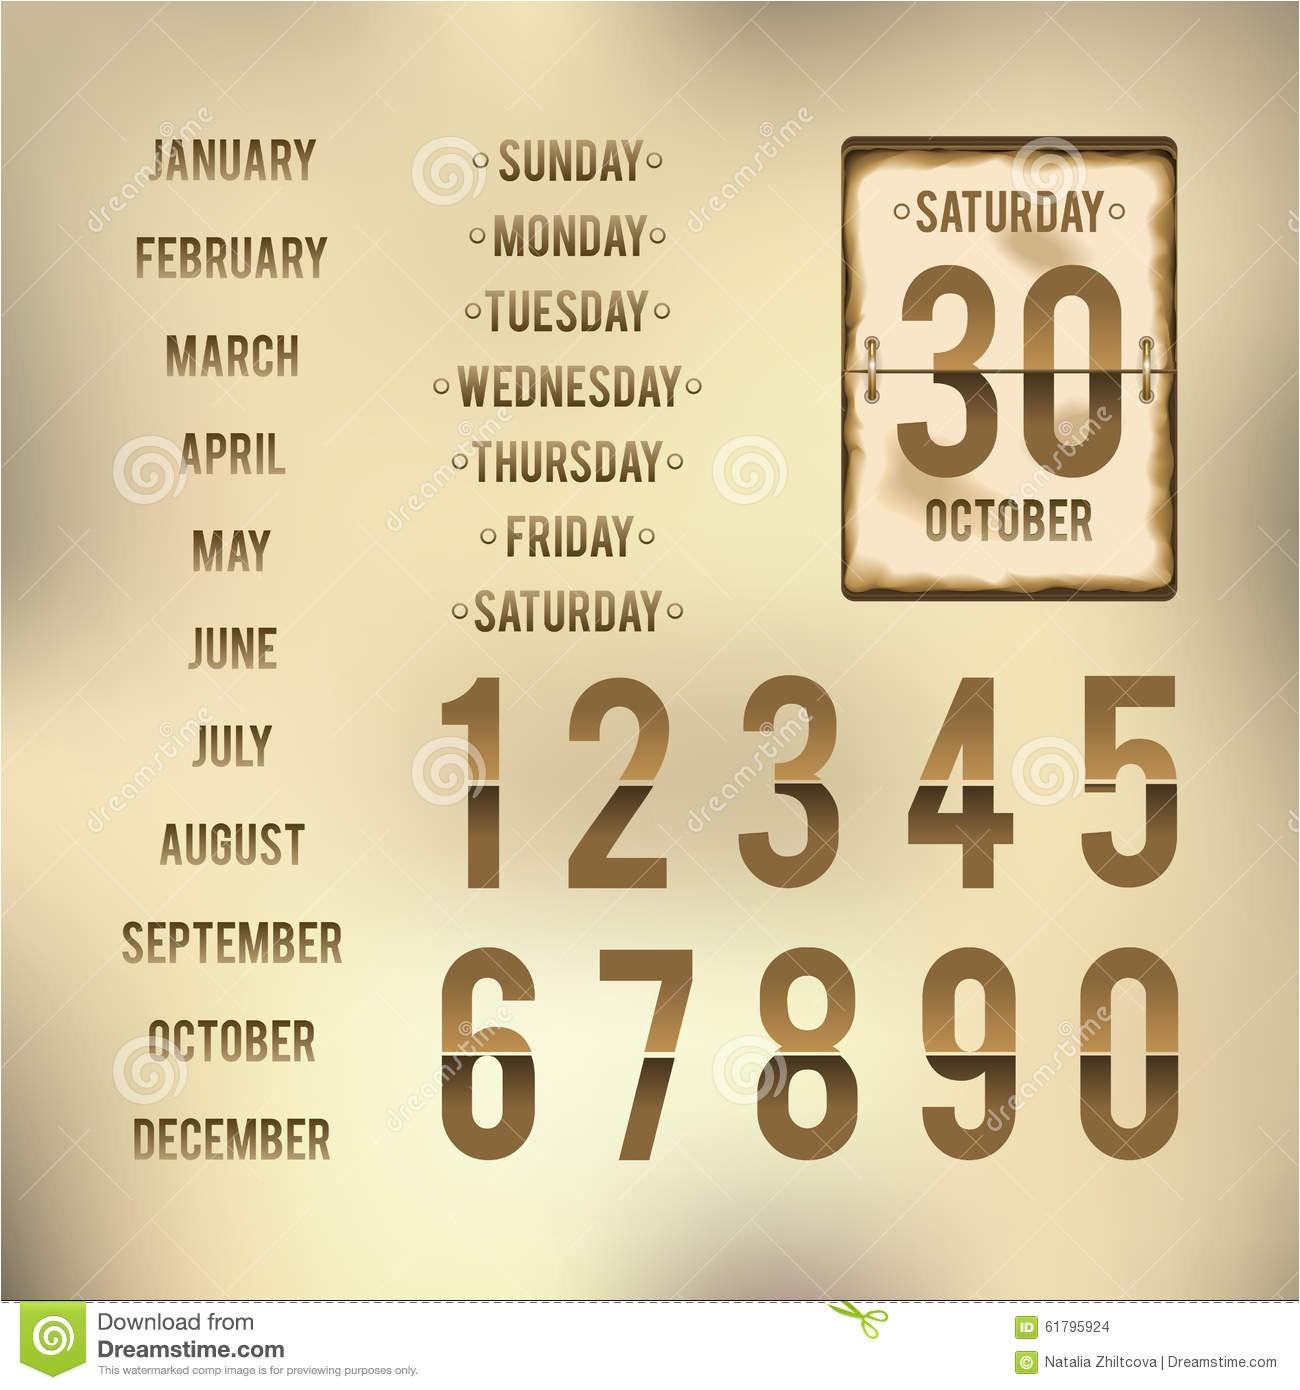 stock illustration template flip calendar burnt edges design image61795924